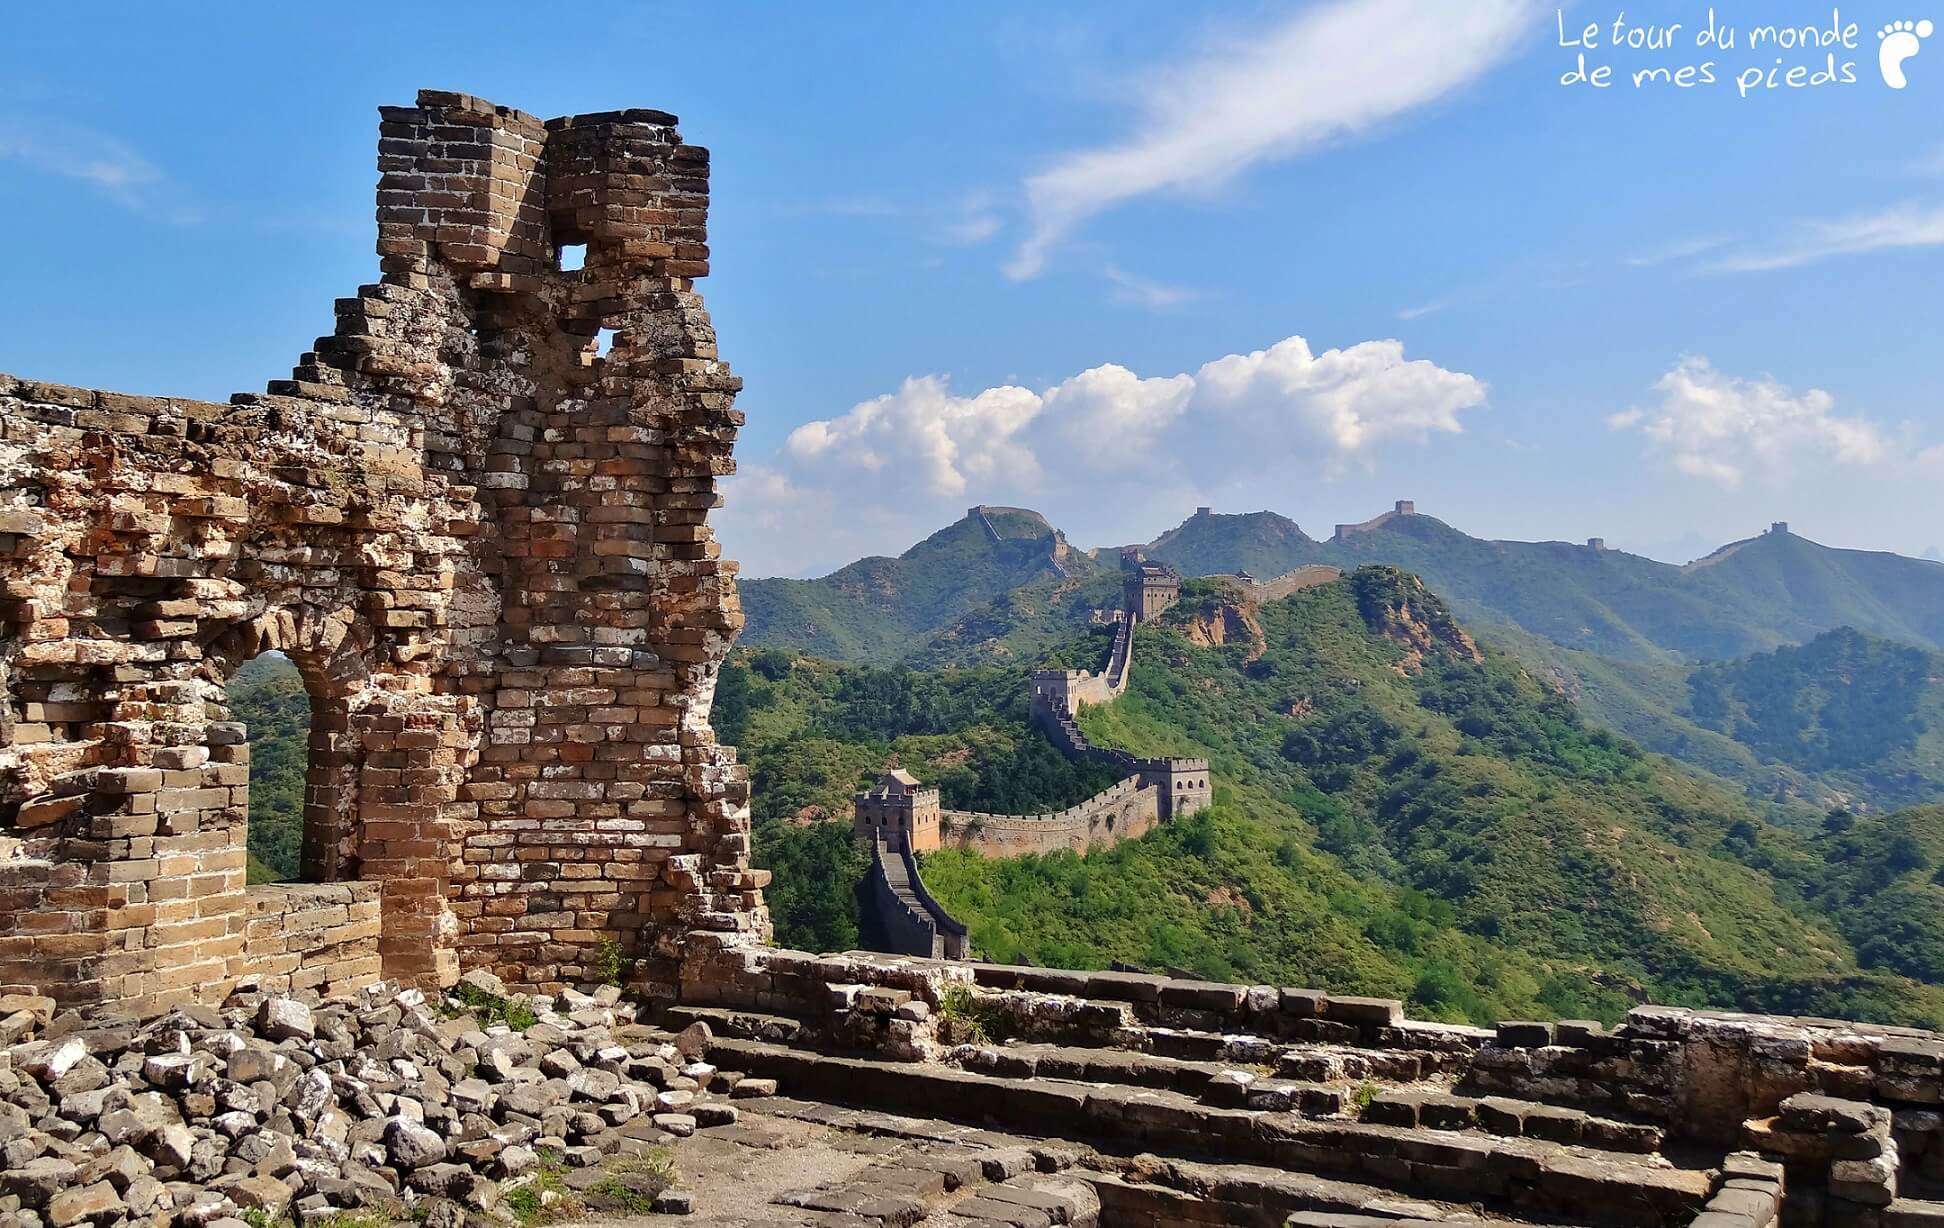 voyage carnet grande muraille chine